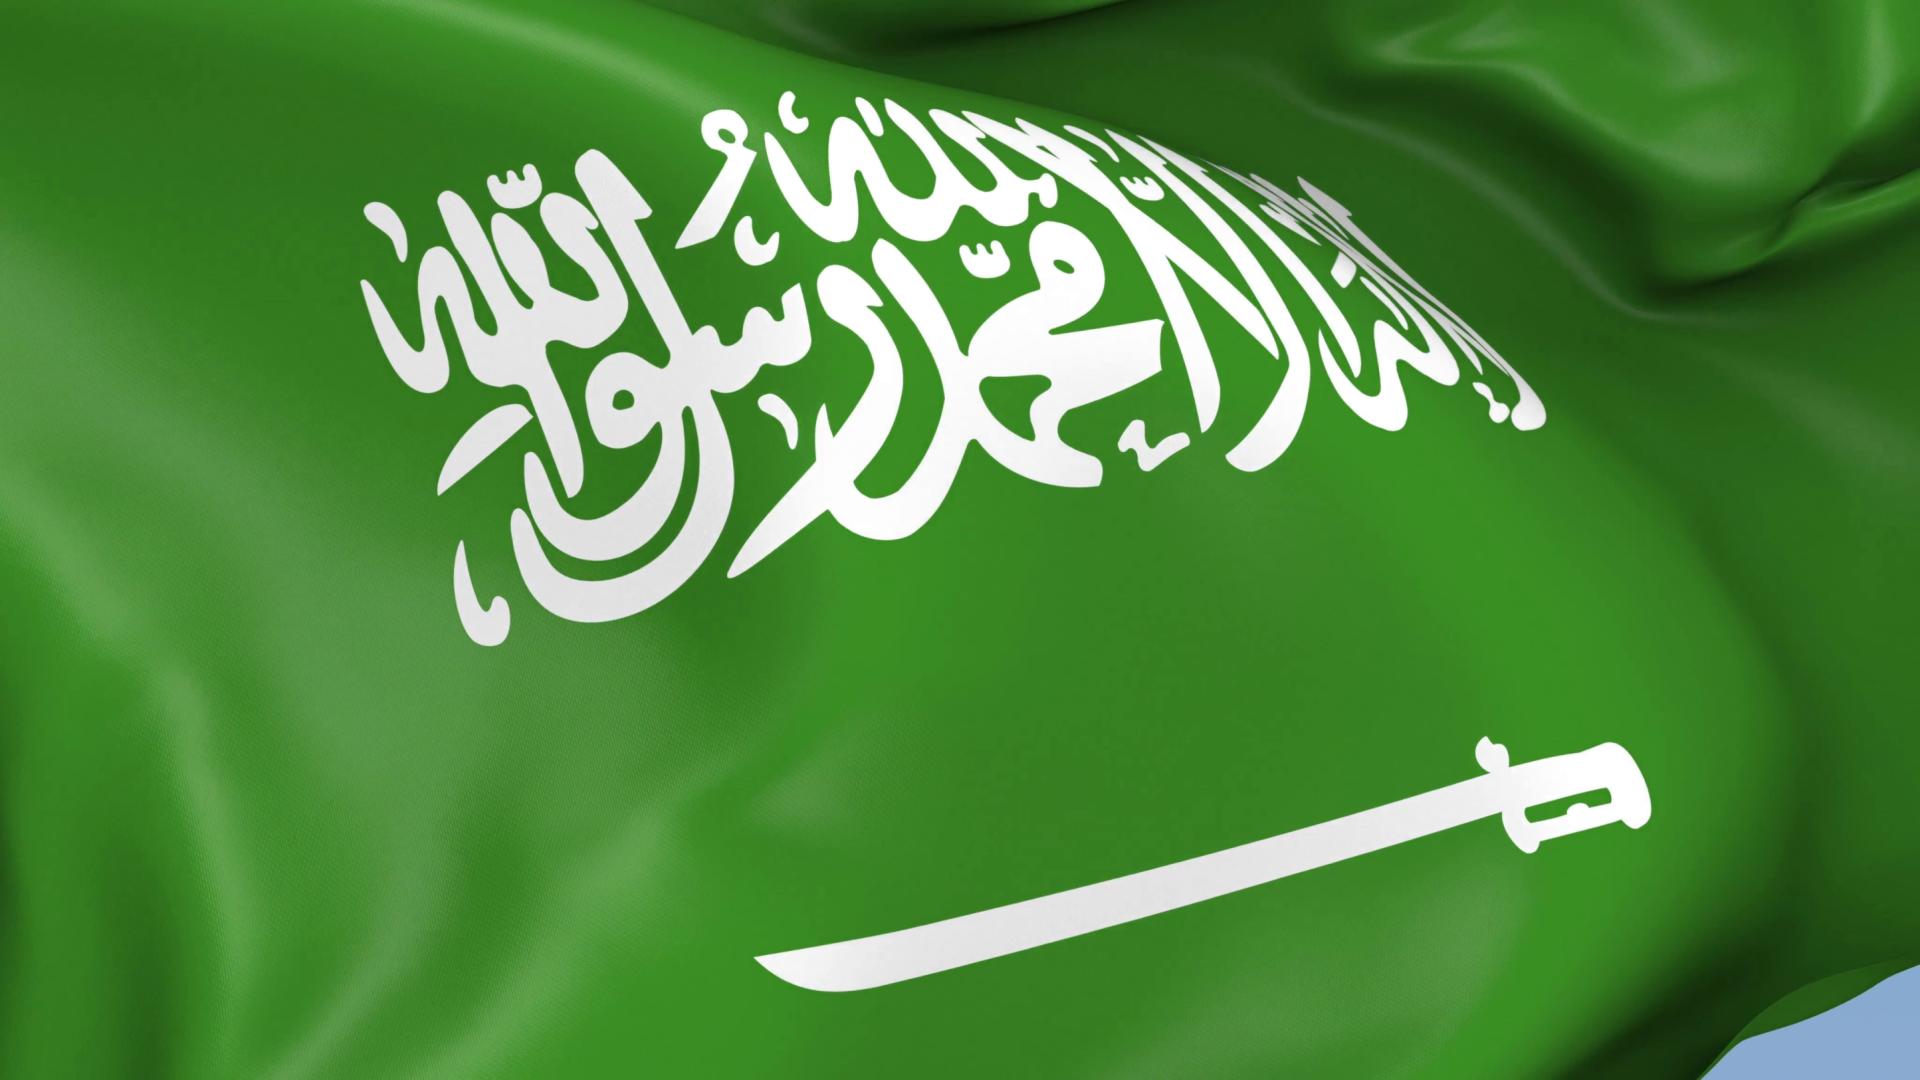 Arabia Saudita, sub tirul diplomatic al comunitatii internationale